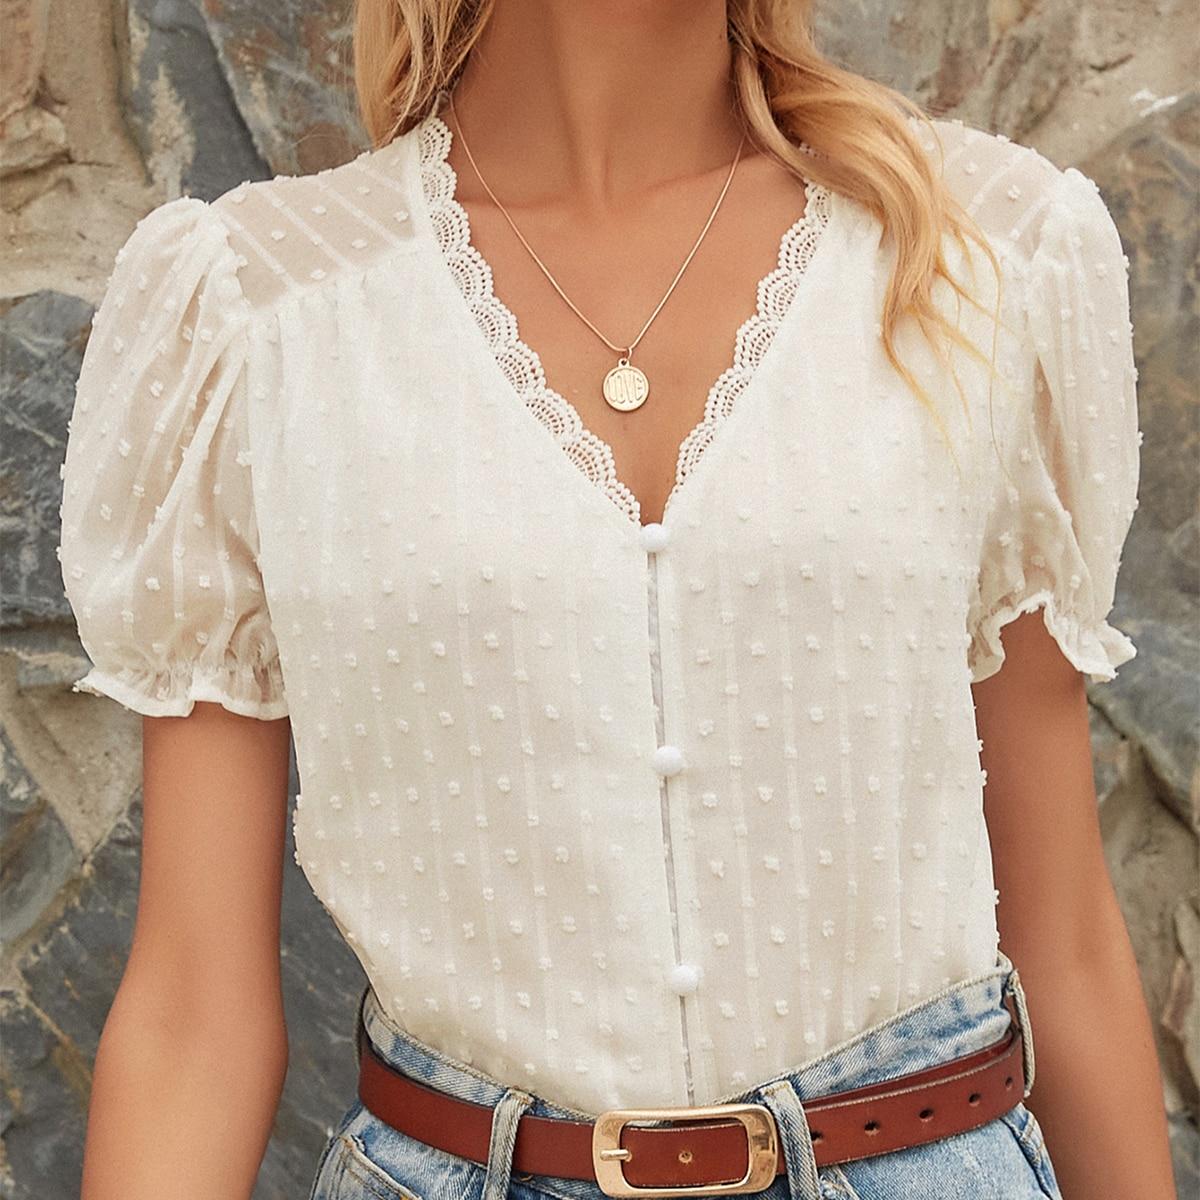 Шифоновая блуза с кружевом SheIn swblouse23210611570